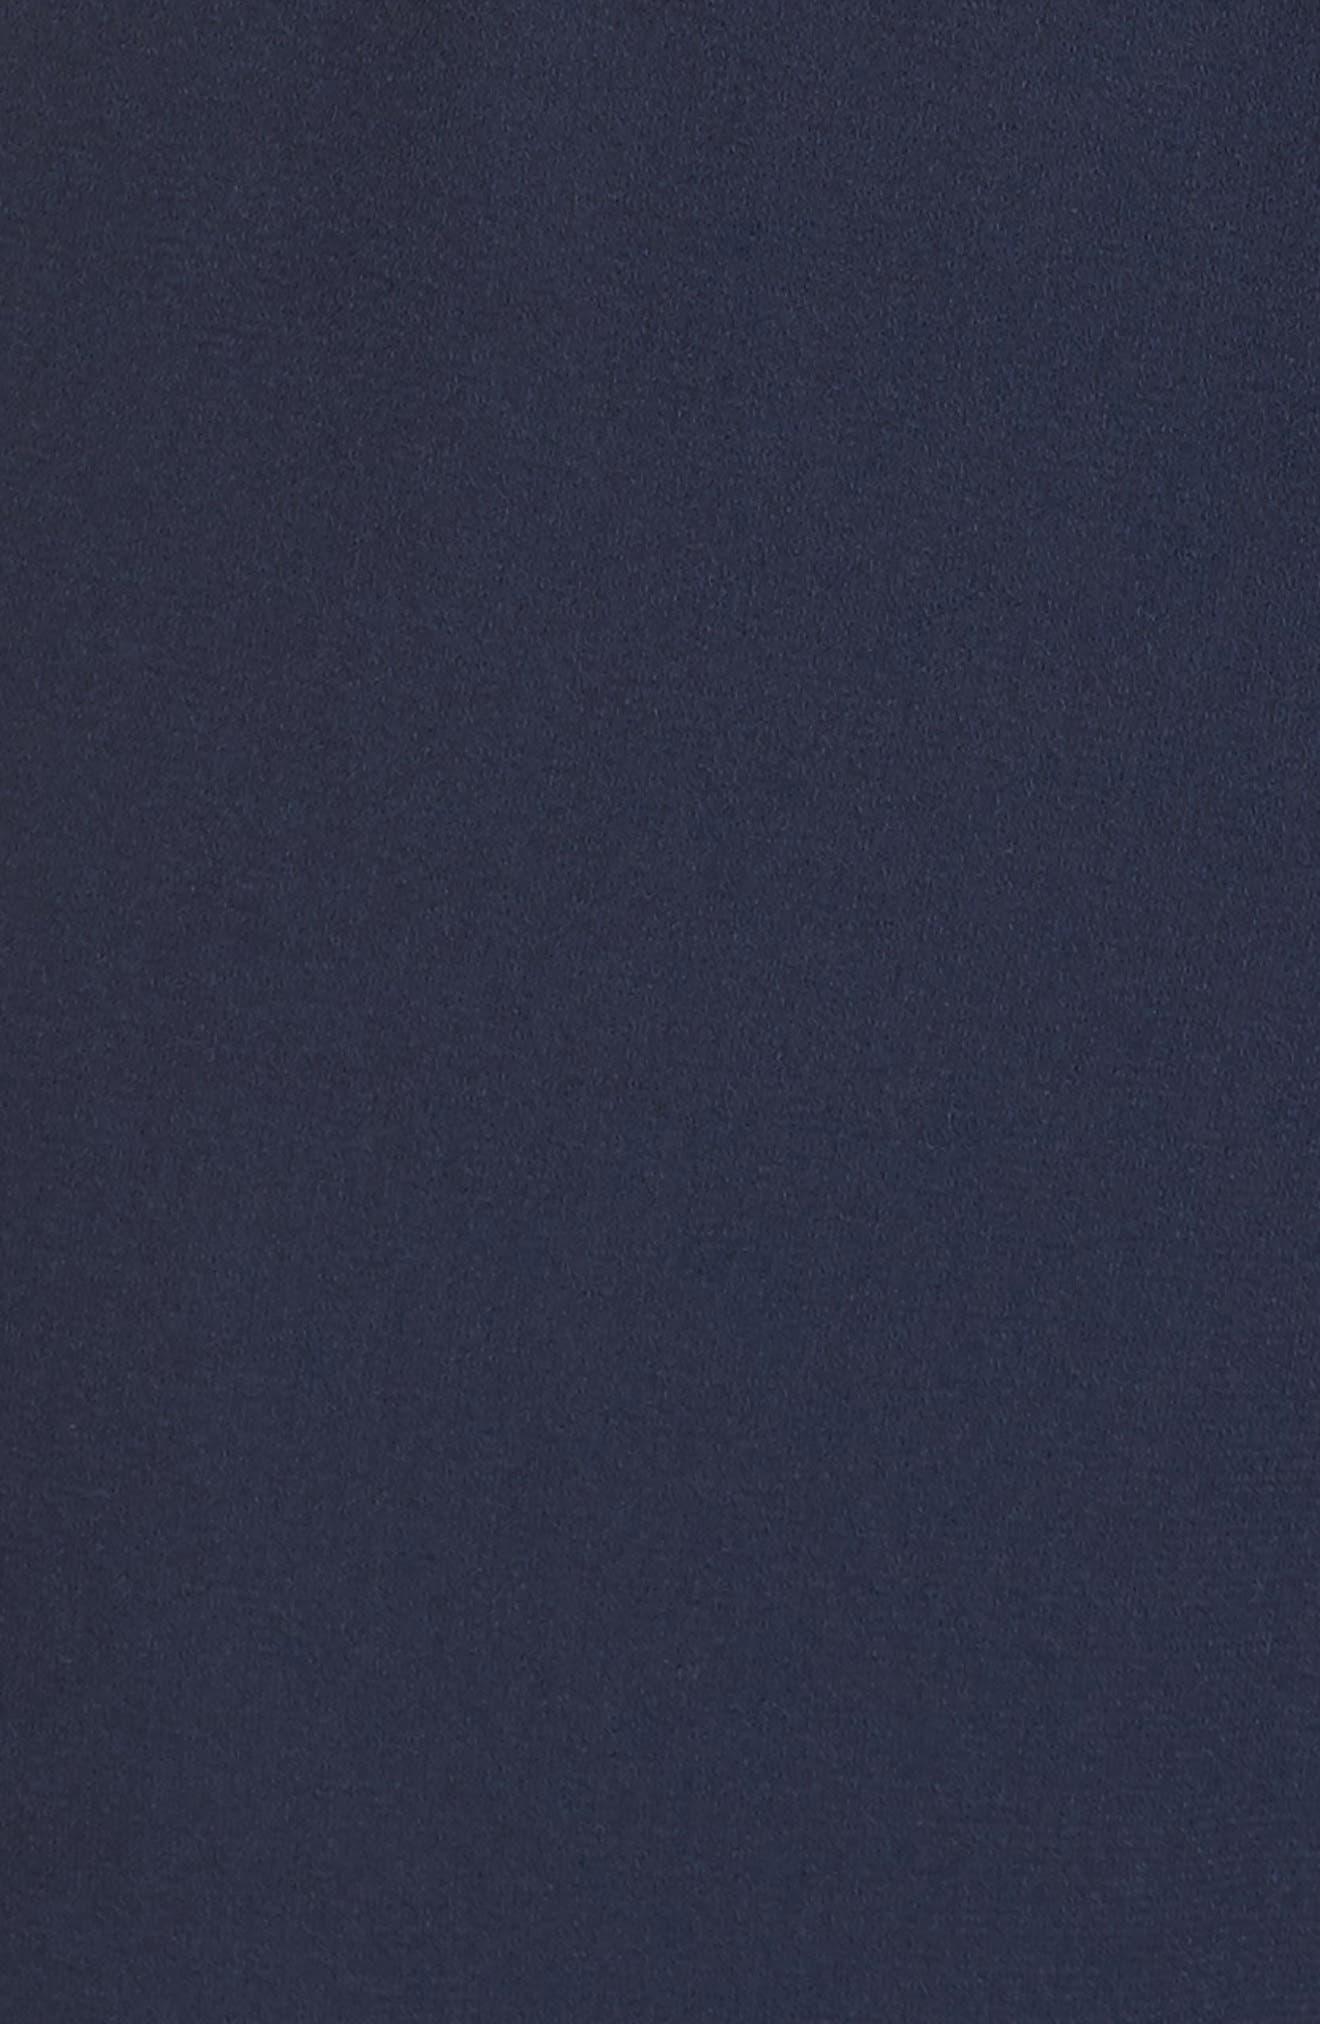 Ruffle Off the Shoulder Jumpsuit,                             Alternate thumbnail 5, color,                             Navy